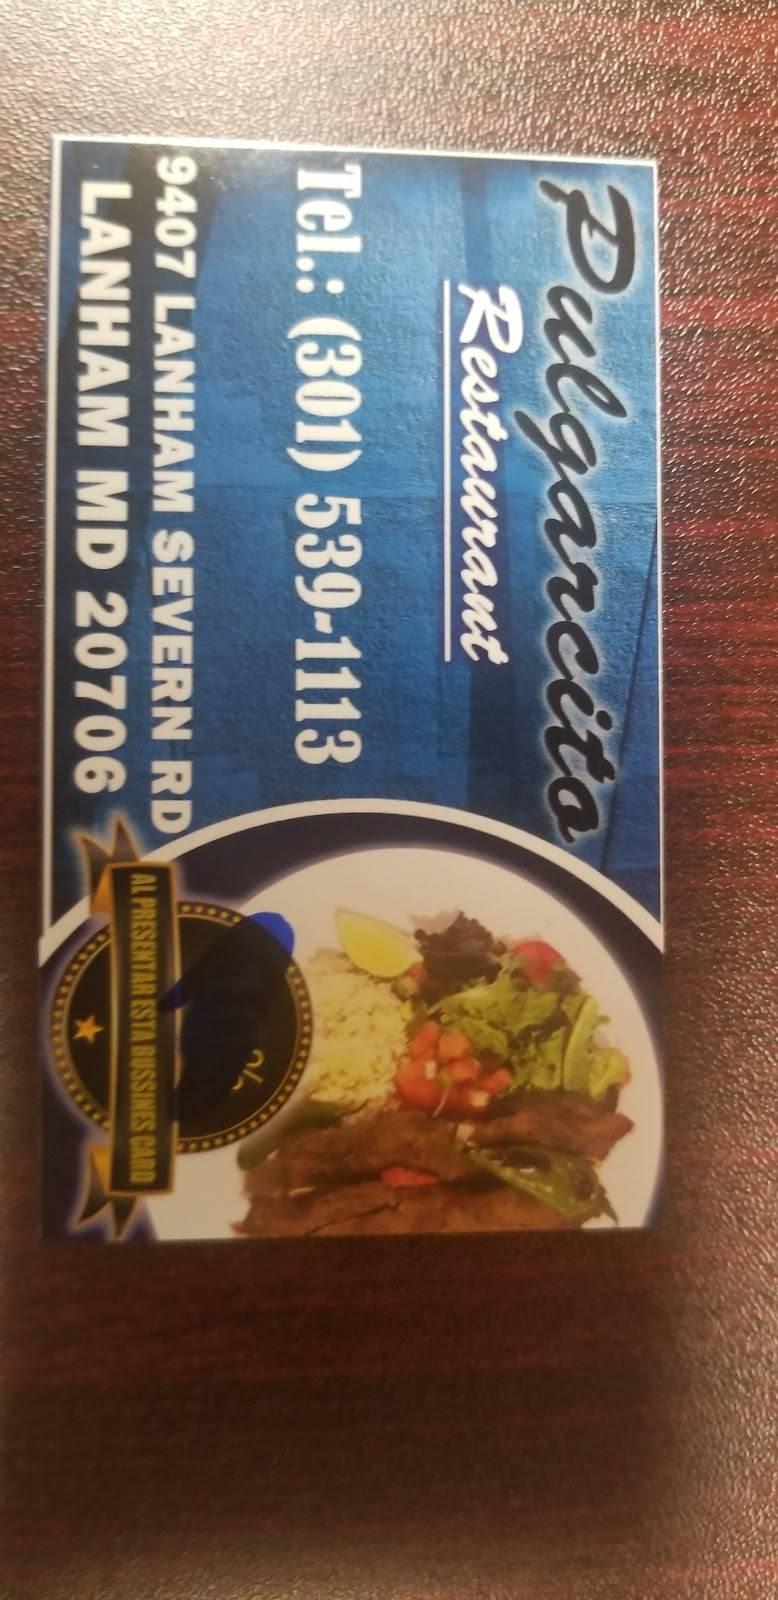 El Pulgarcito | restaurant | Seabrook, MD 20706, USA | 3015391113 OR +1 301-539-1113